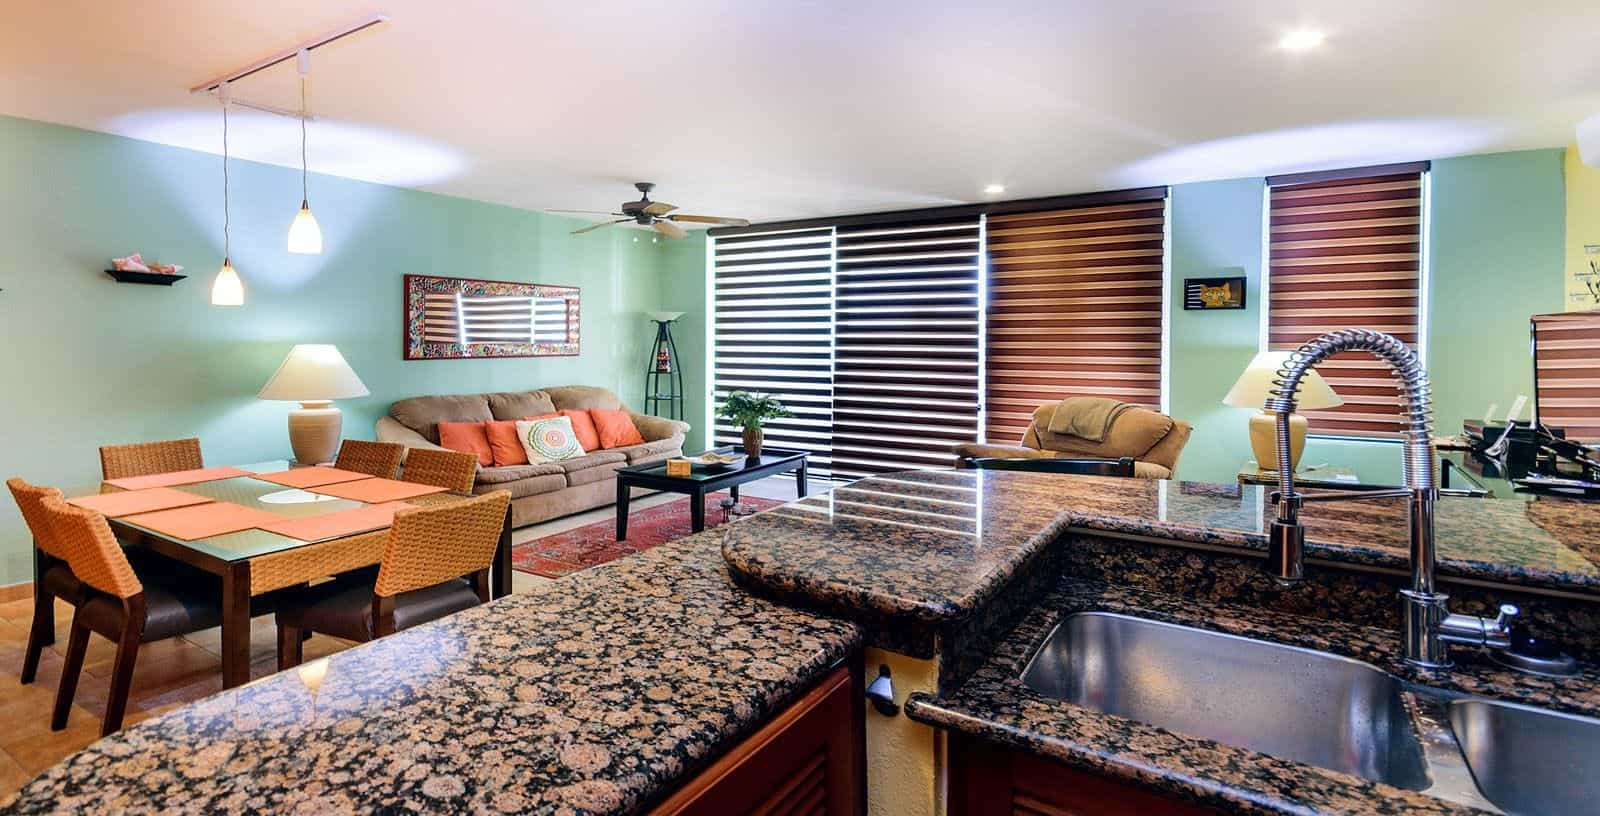 residencias reef 8340